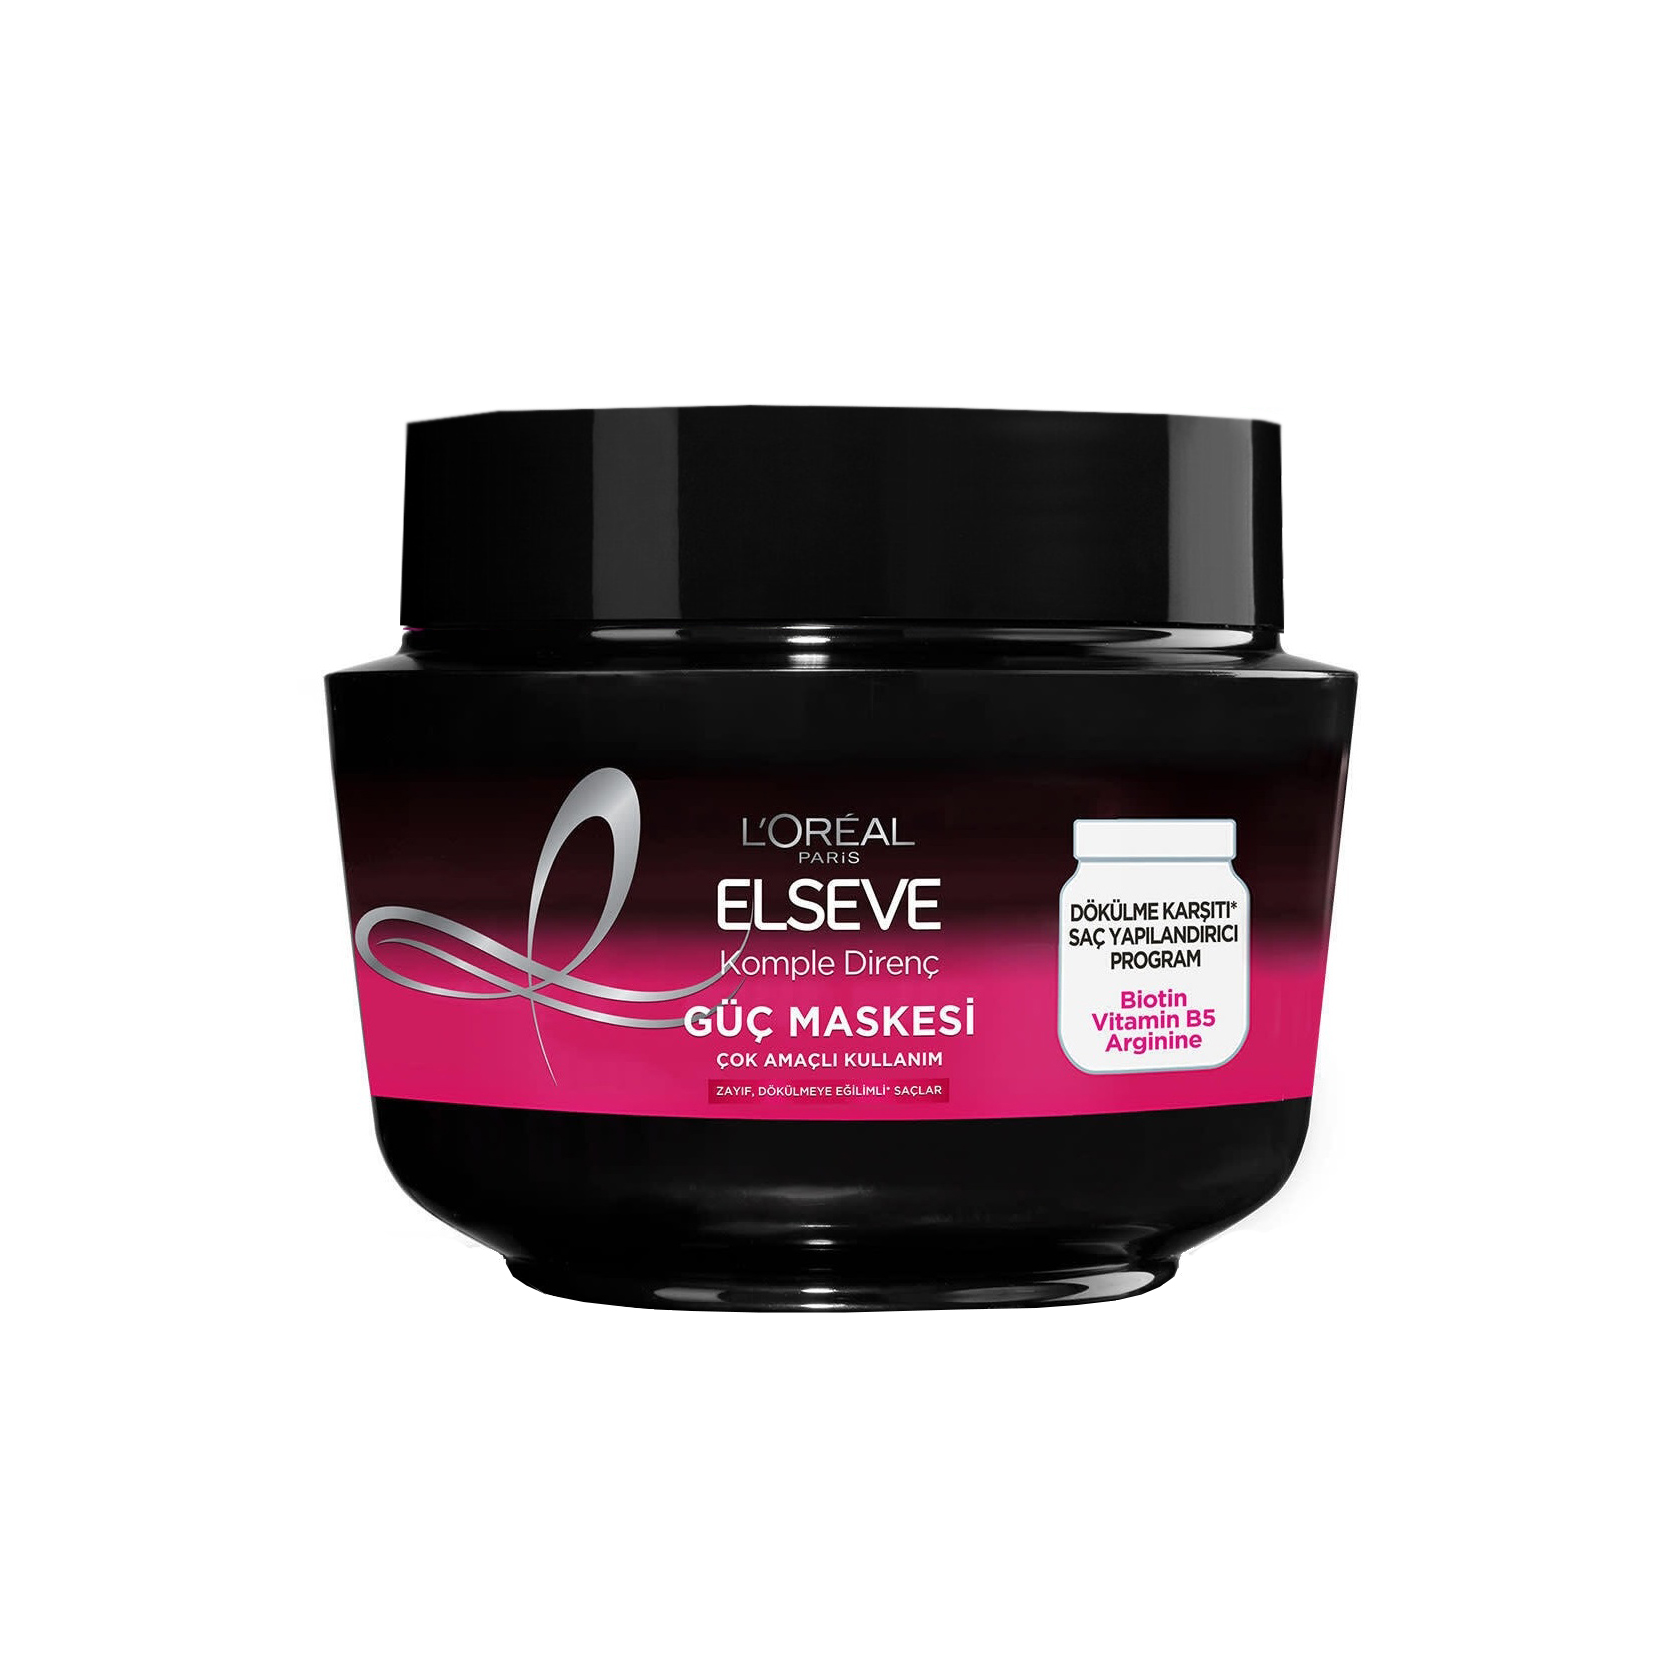 ماسک مو لورآل سری ELSEVE مدل Komple Direnç ضد ریزش مو مخصوص موهای ضعیف 300 میلی لیتر